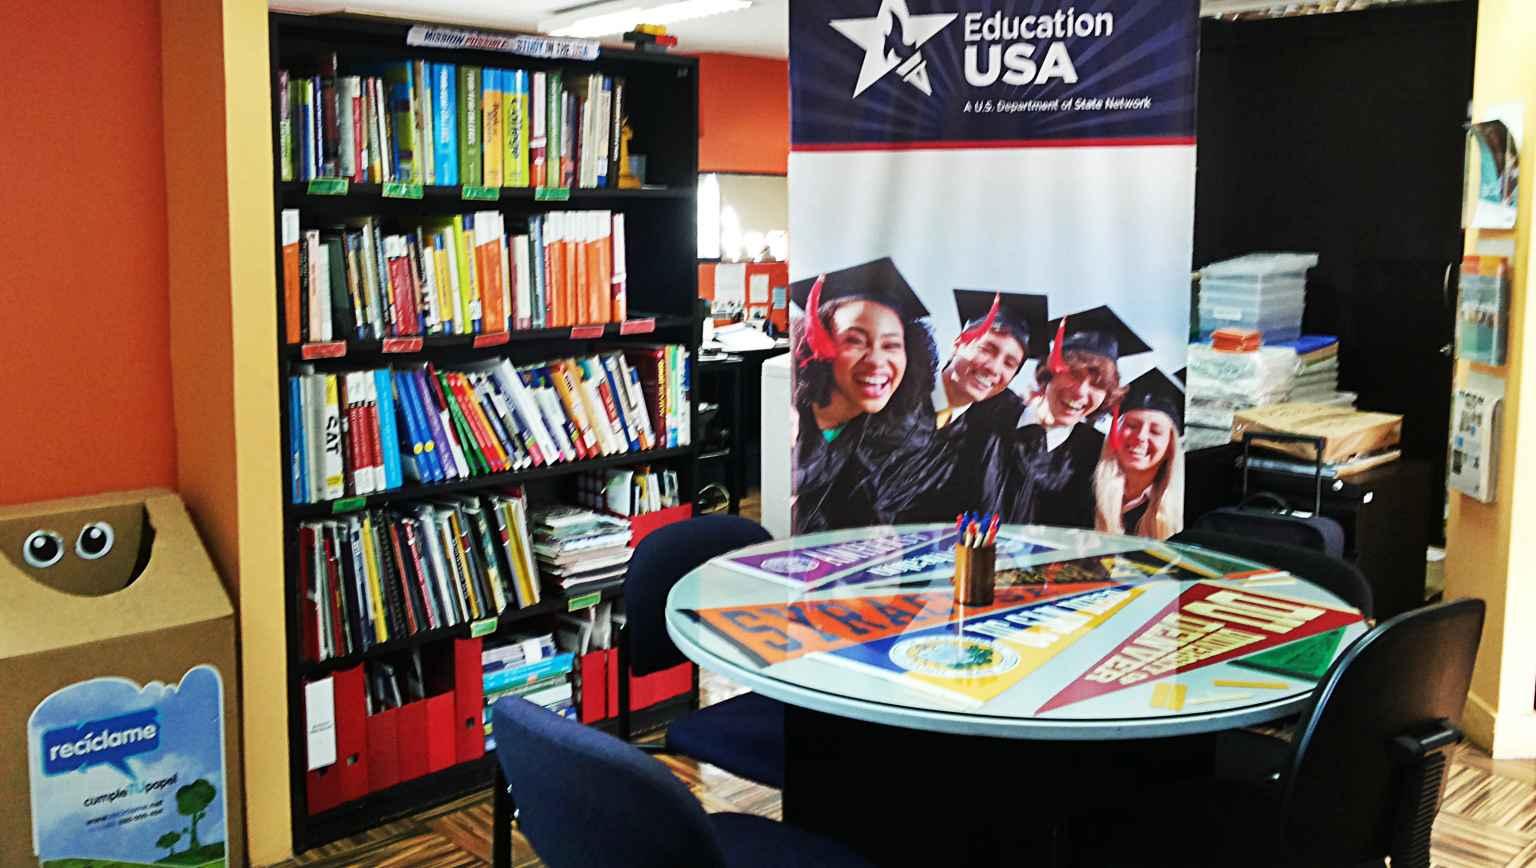 EducationUSA Library